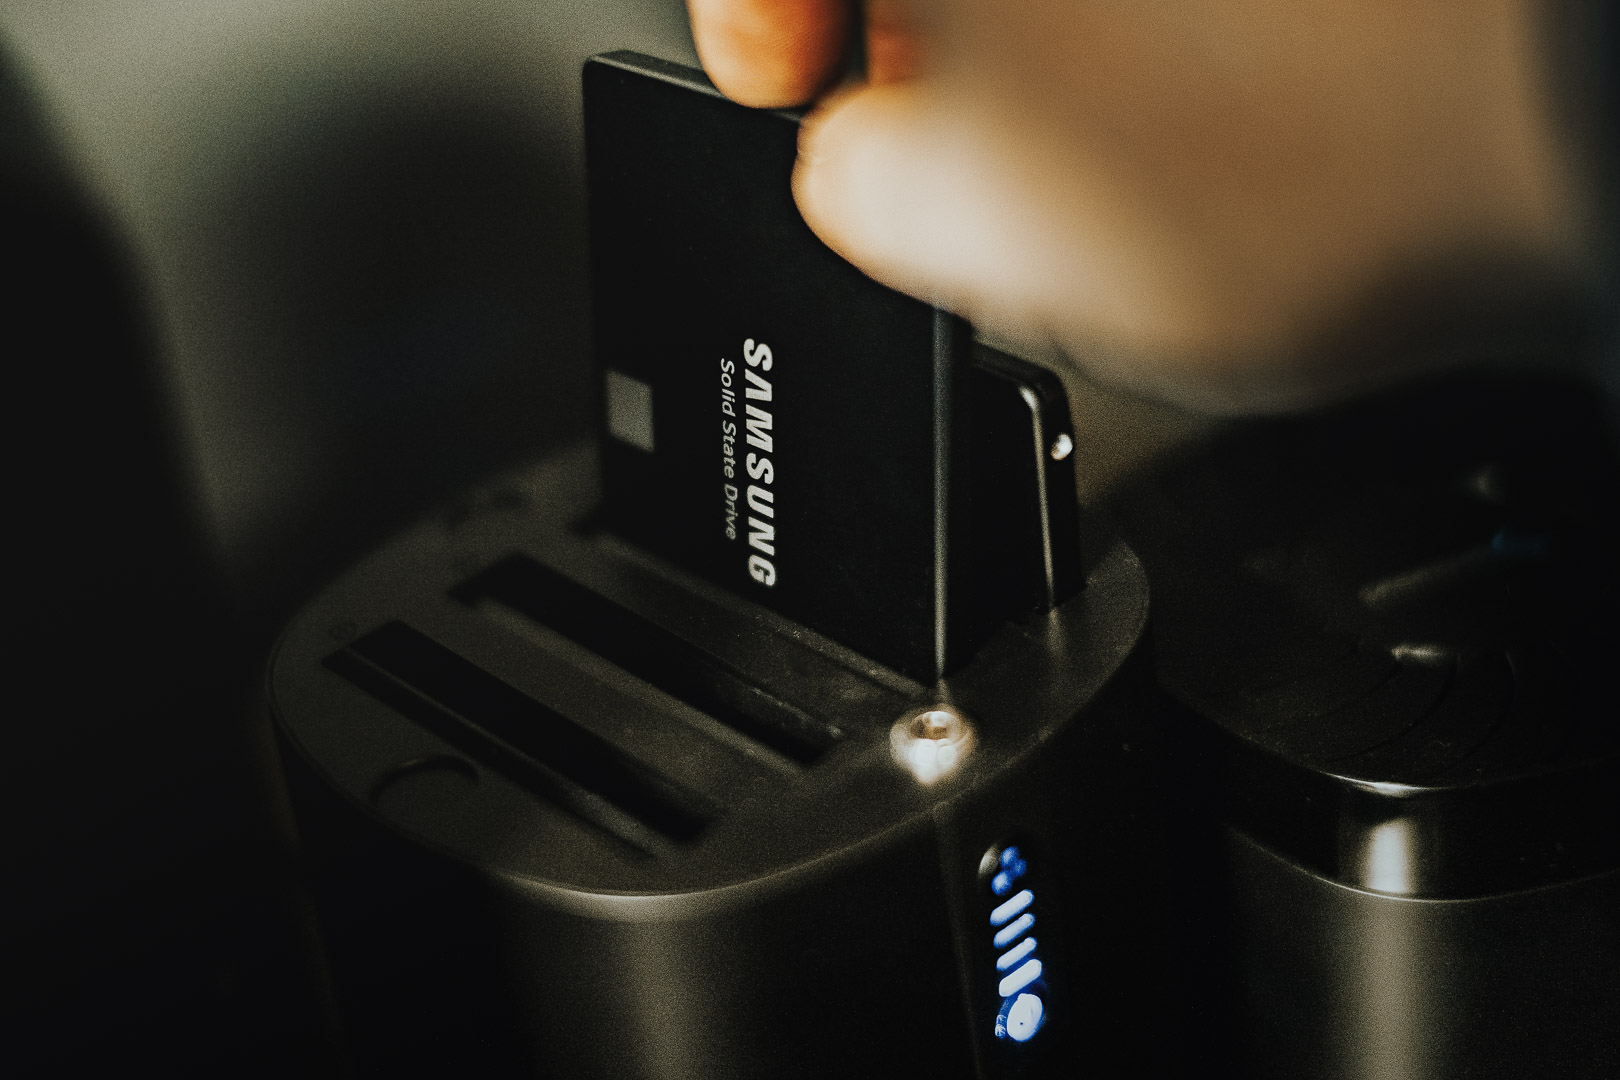 4 Bay Sabrent SSD Enclosure USB 3.0